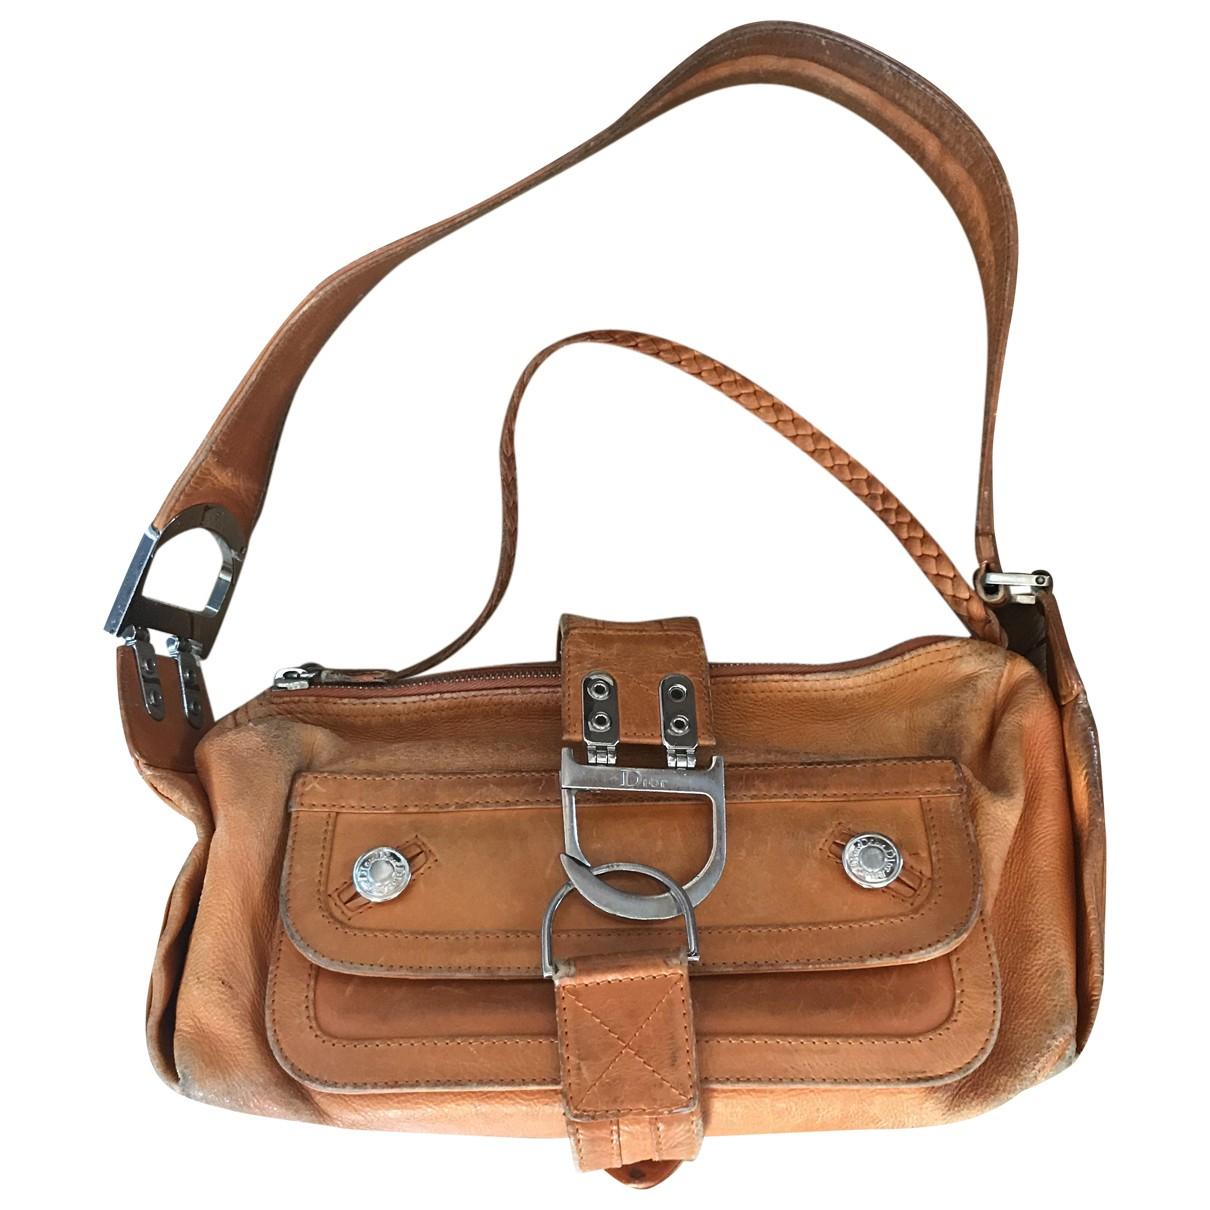 Dior \N Camel Leather handbag for Women \N